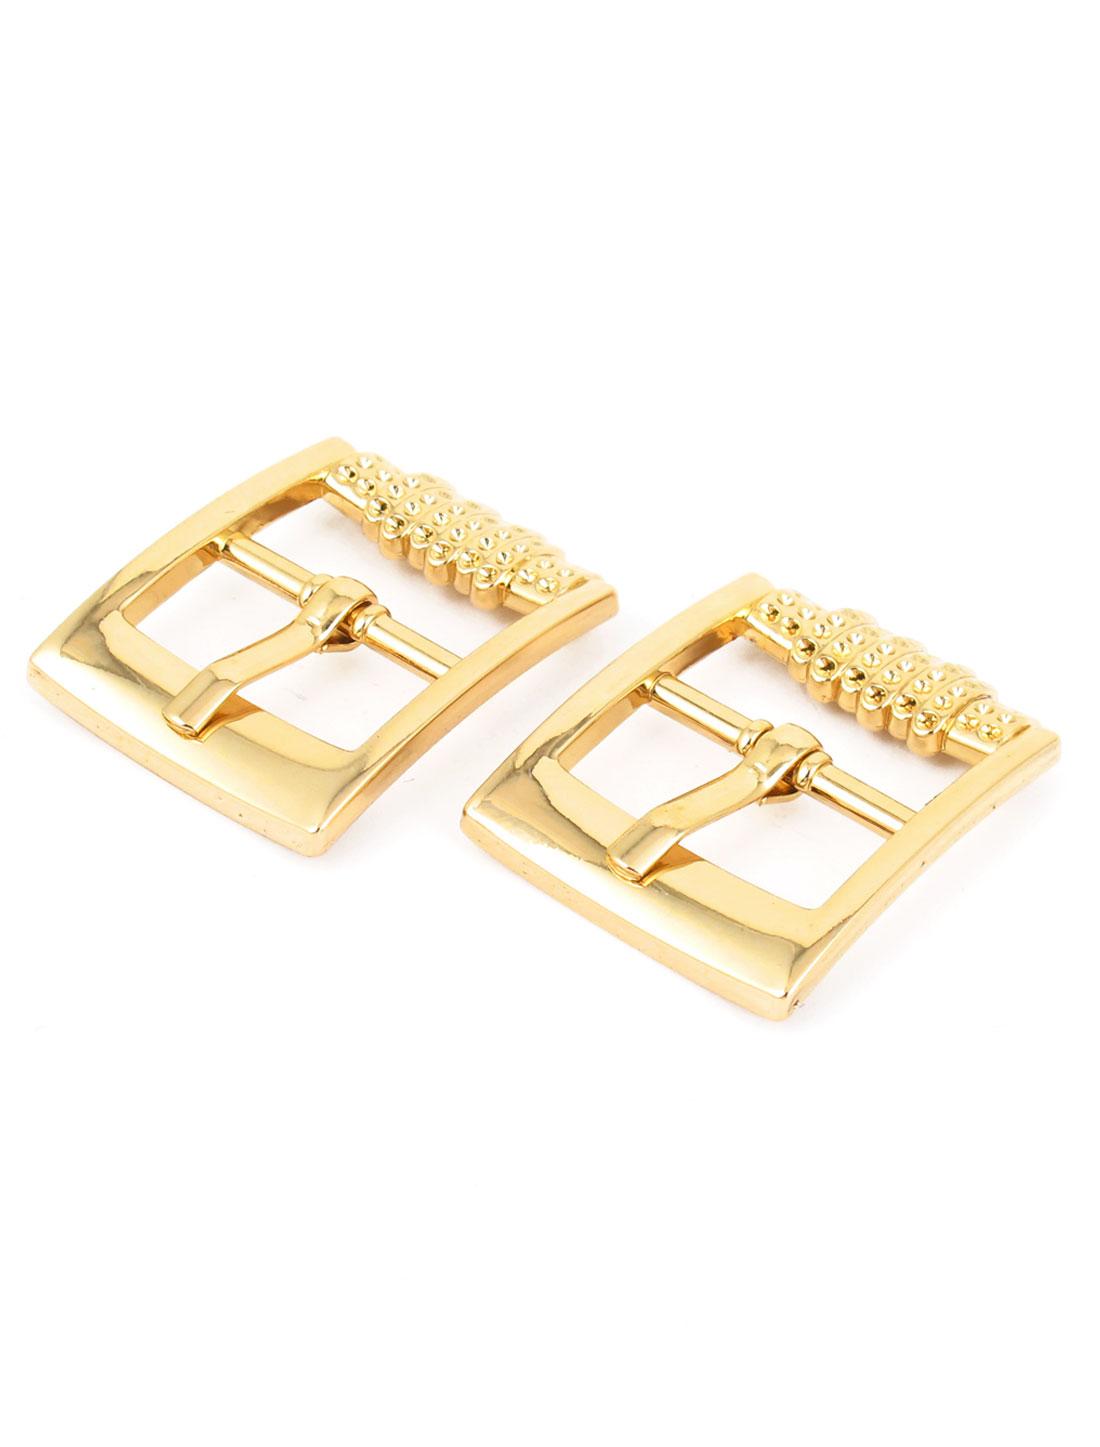 2 Pcs Gold Tone Metal Rectangular Belt Single Pin Buckle